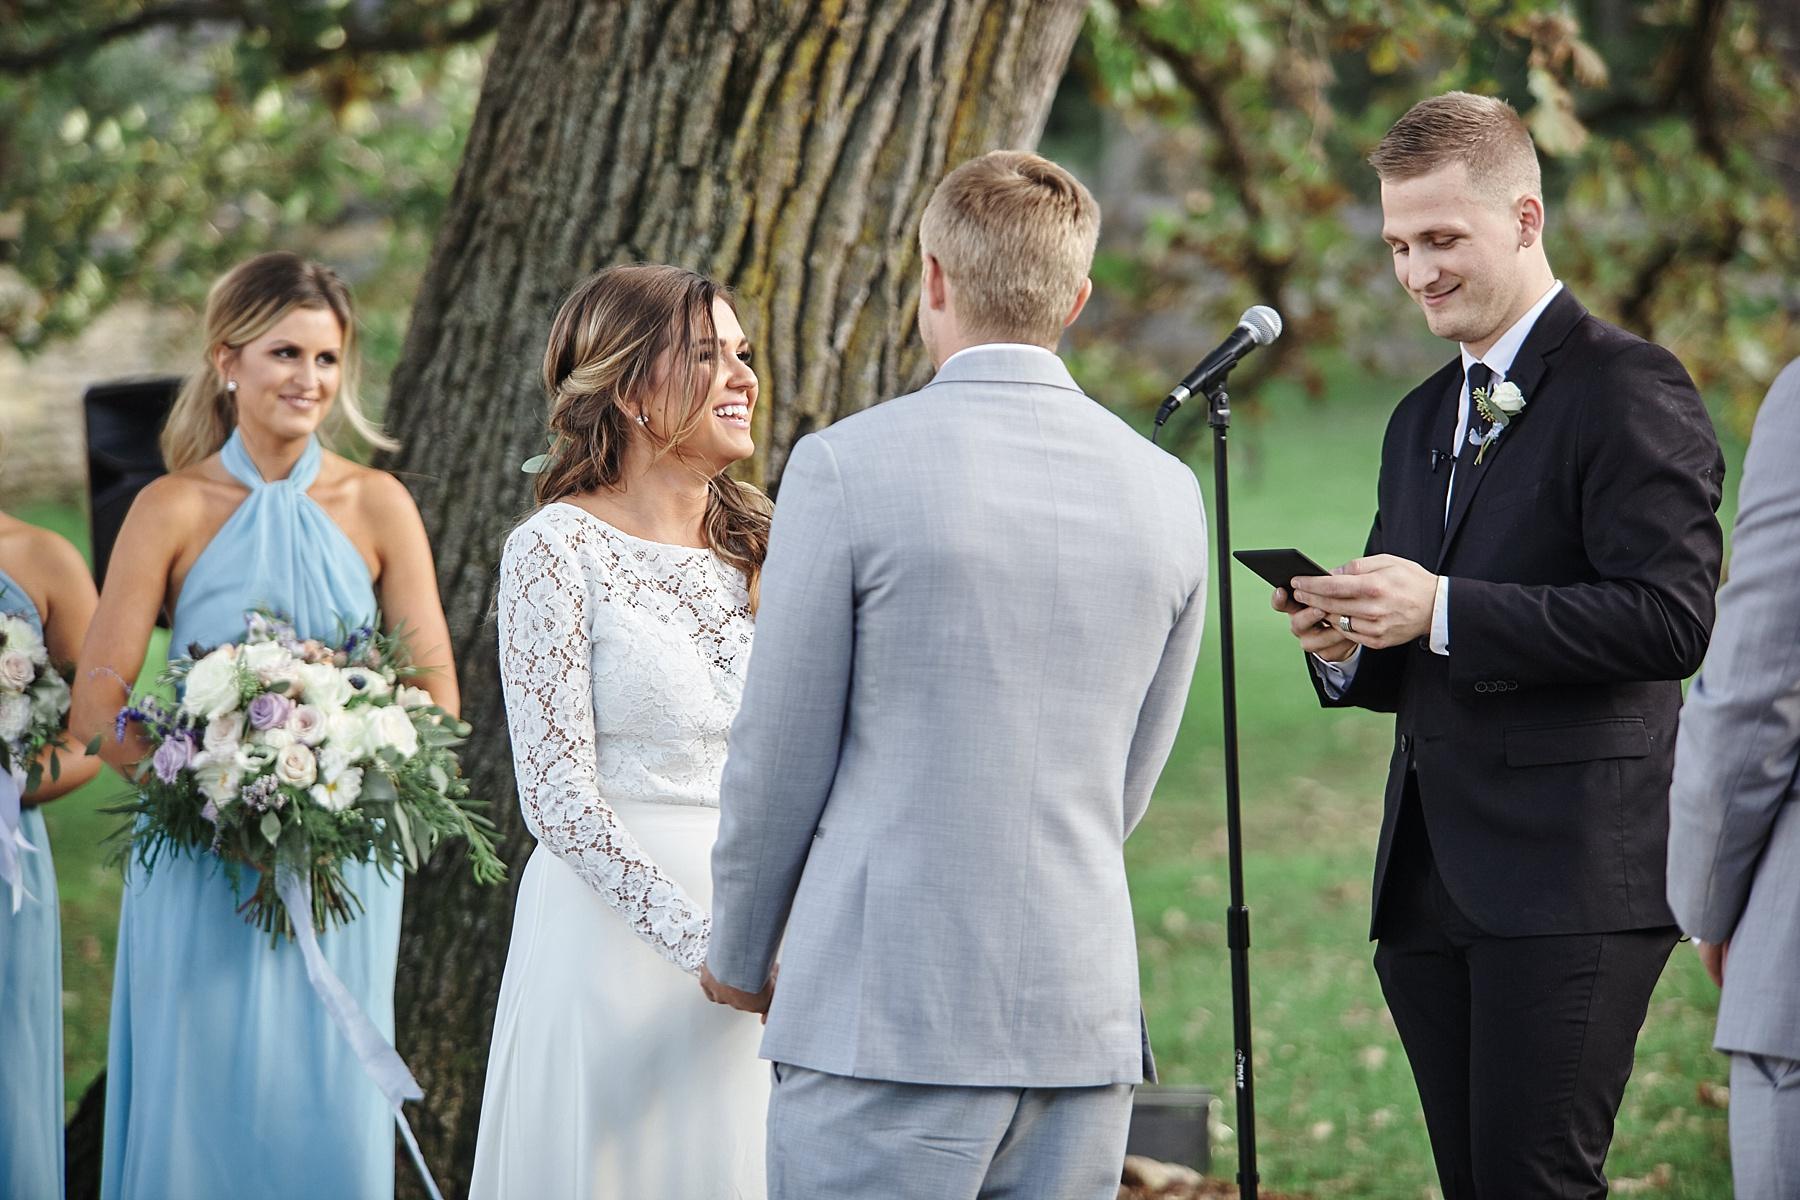 Maywood-Stone-Barn-Wedding-Rochester-Minnesota-Perry-James-Photo_0642.jpg